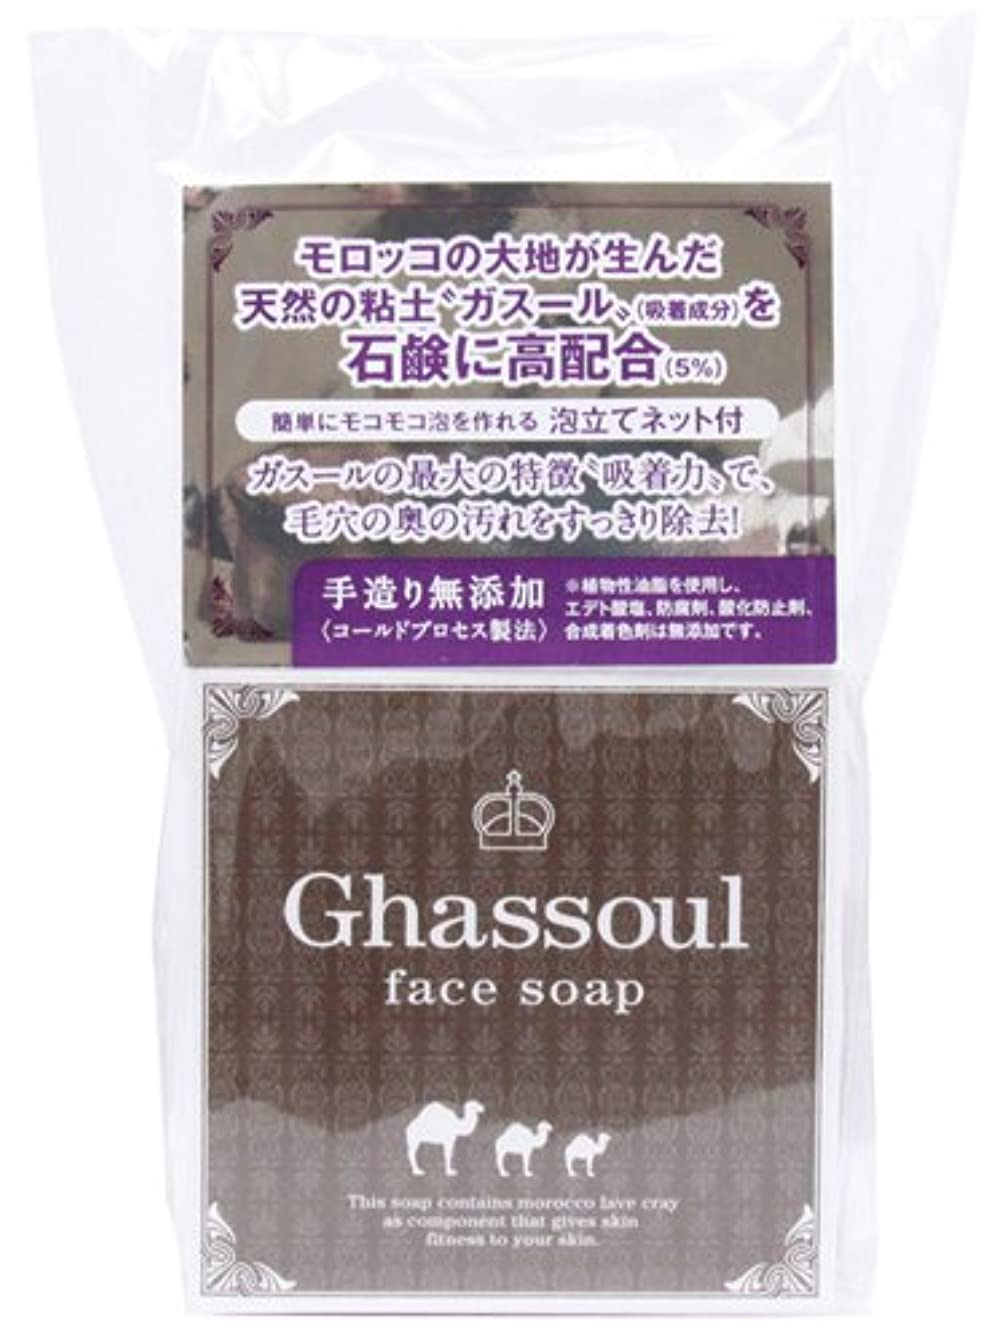 Ghassoul face soap ガスールフェイスソープ 100g